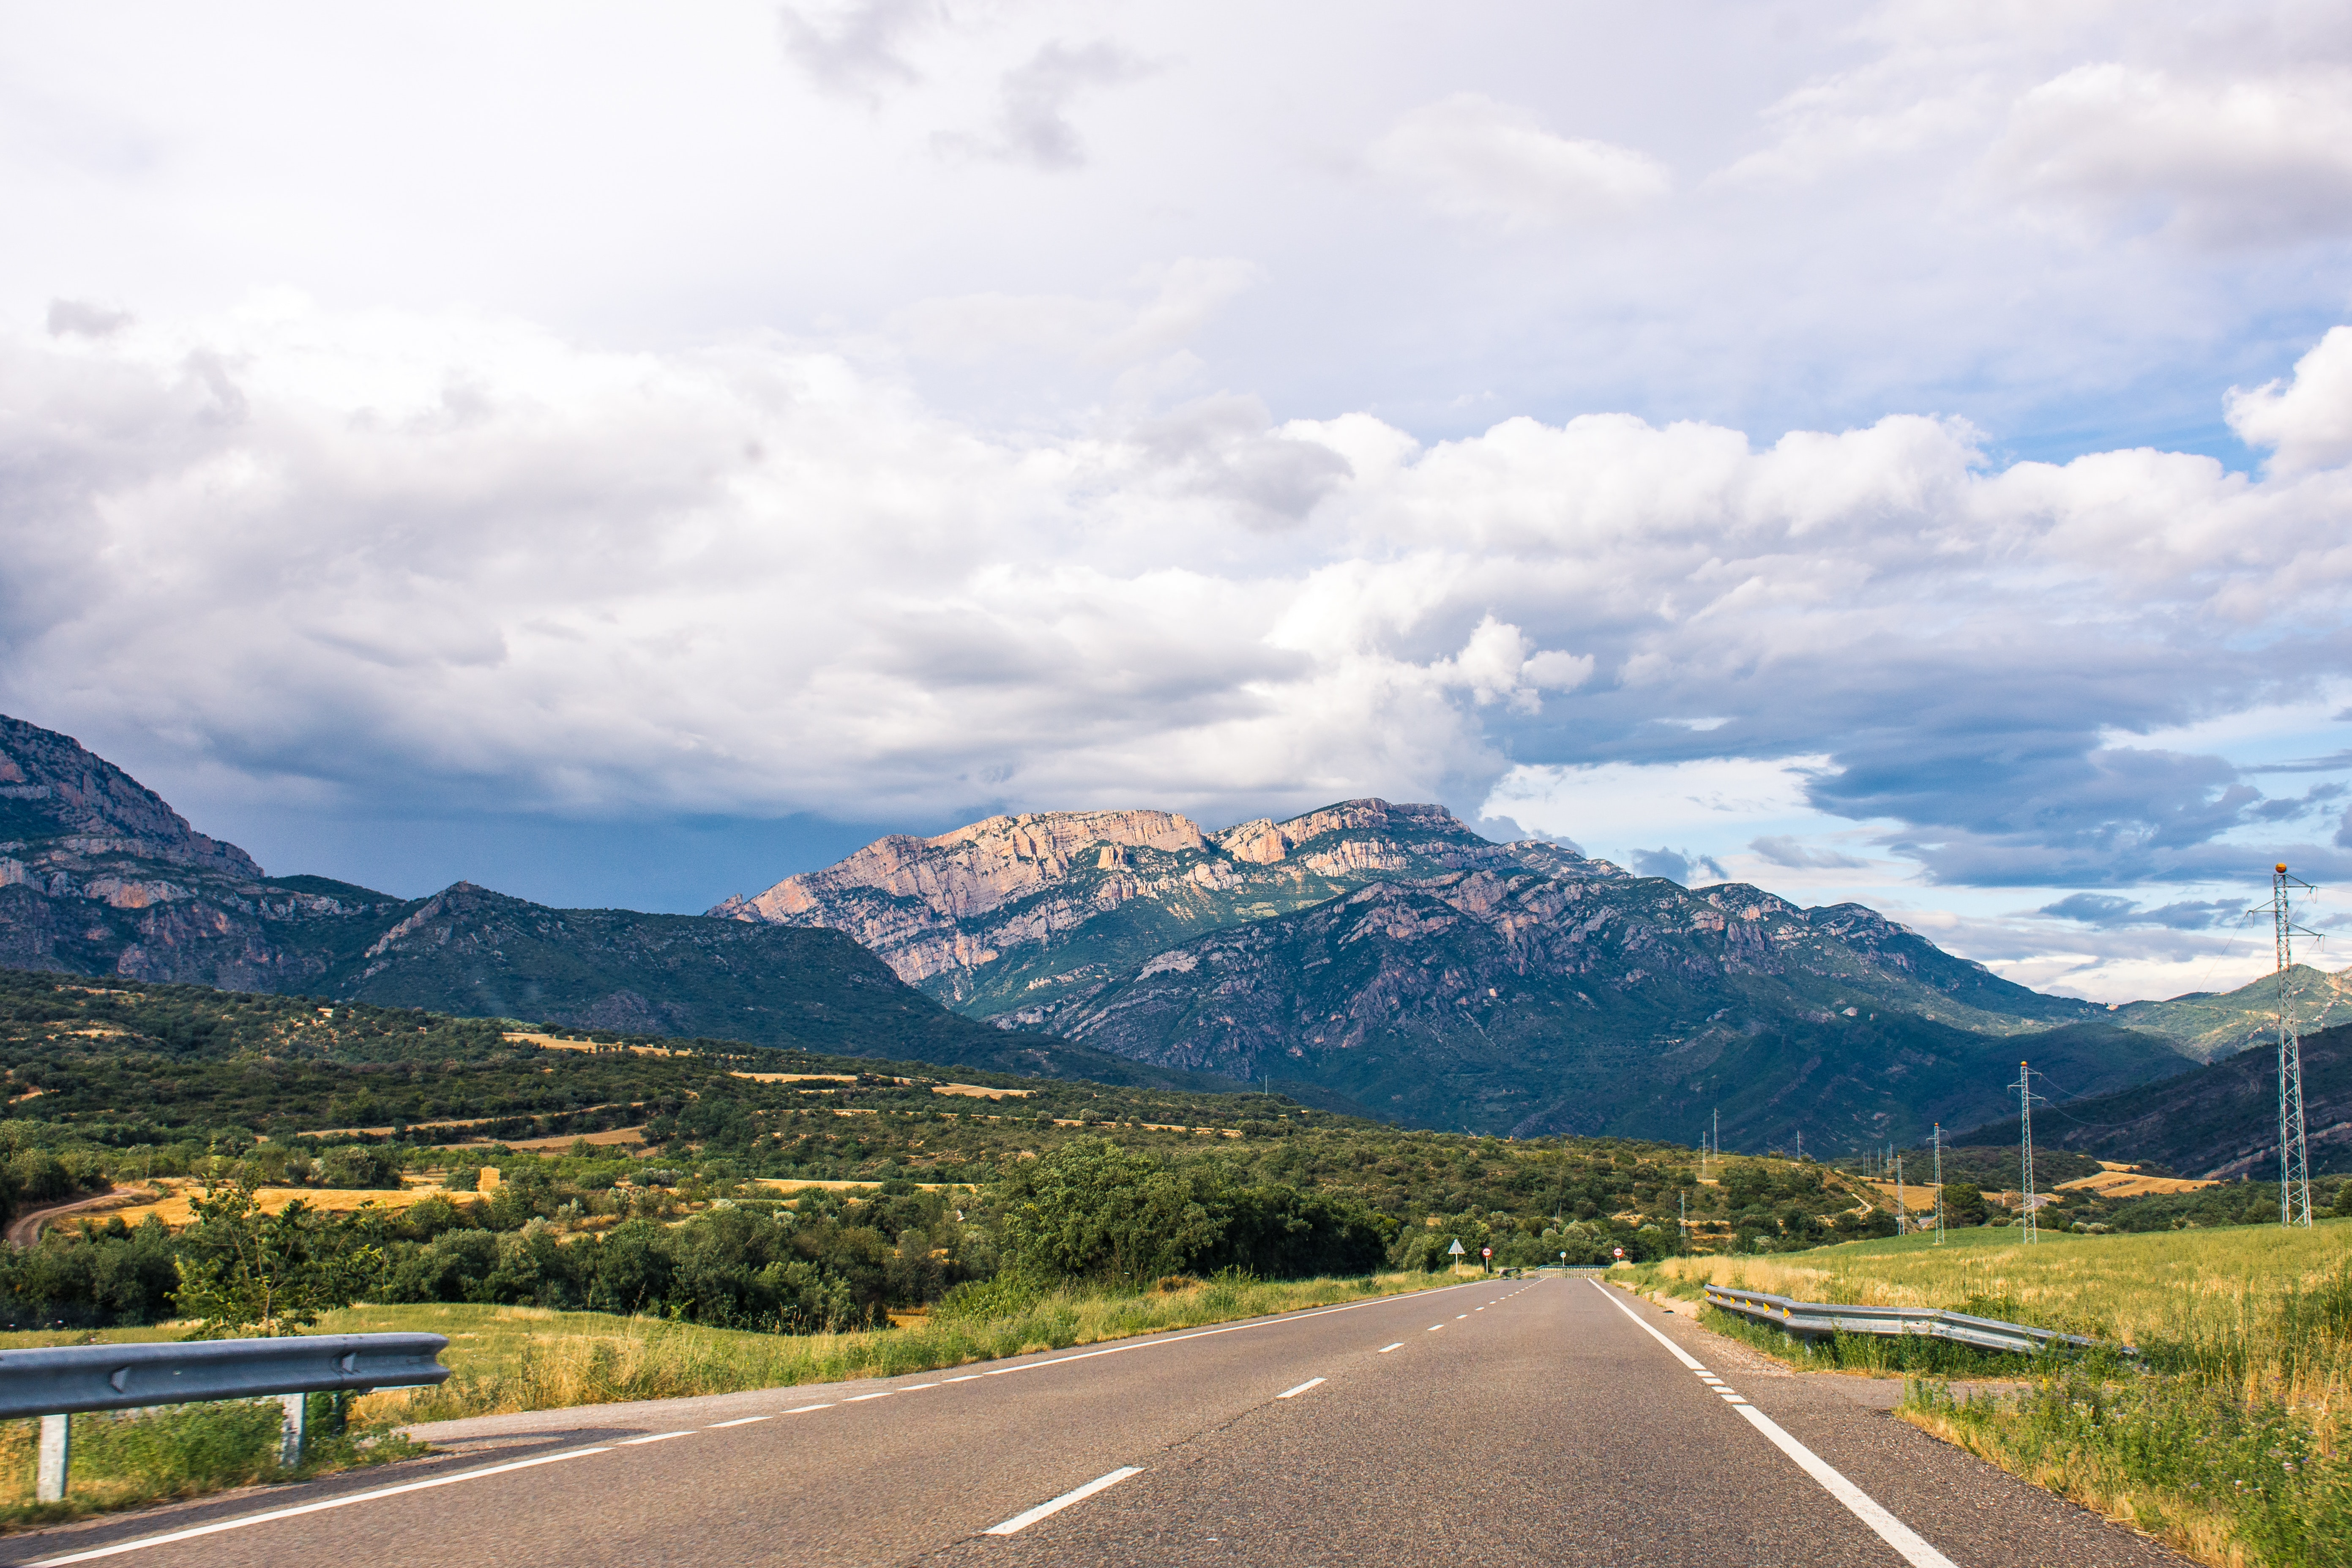 Road near mountain photo